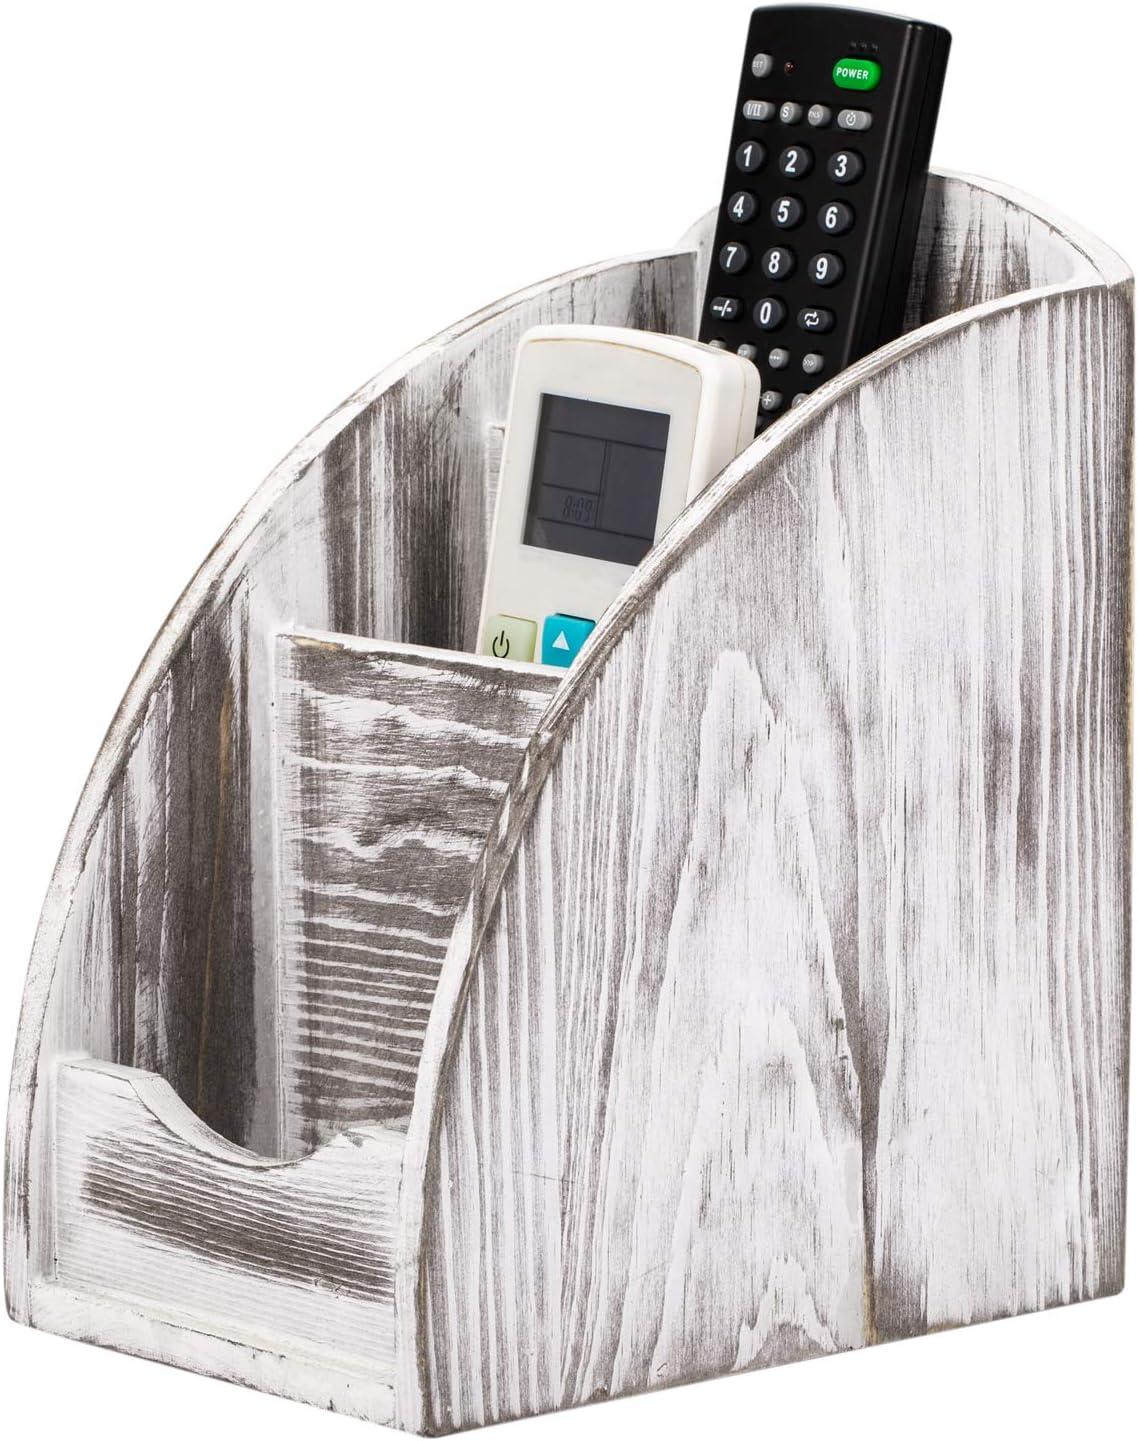 NEX Classic Remote San Diego Mall Control Holder 3 Me Wooden Slot Caddy